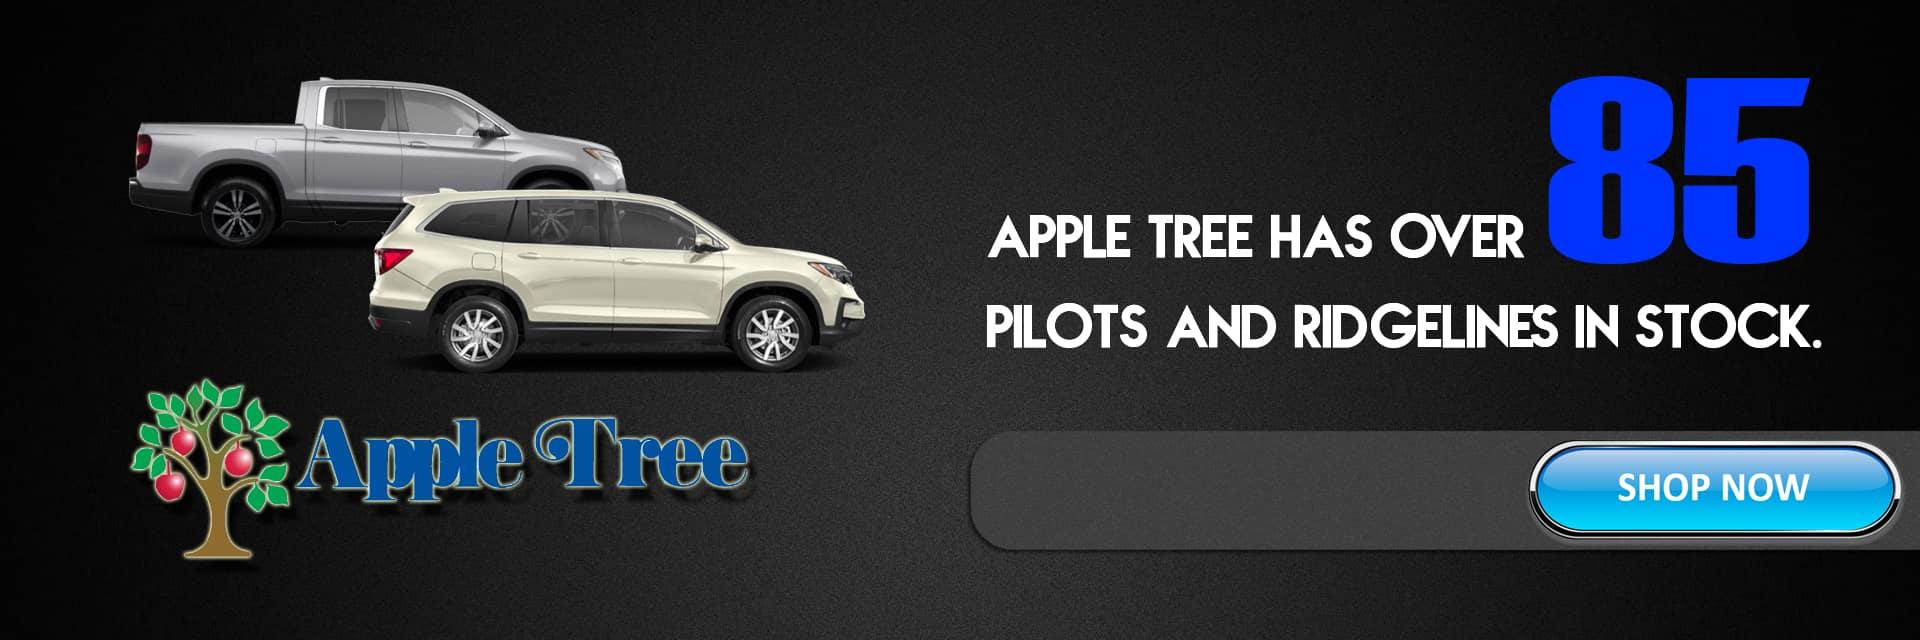 Apple Tree Honda New And Used Honda Dealer In Fletcher Nc